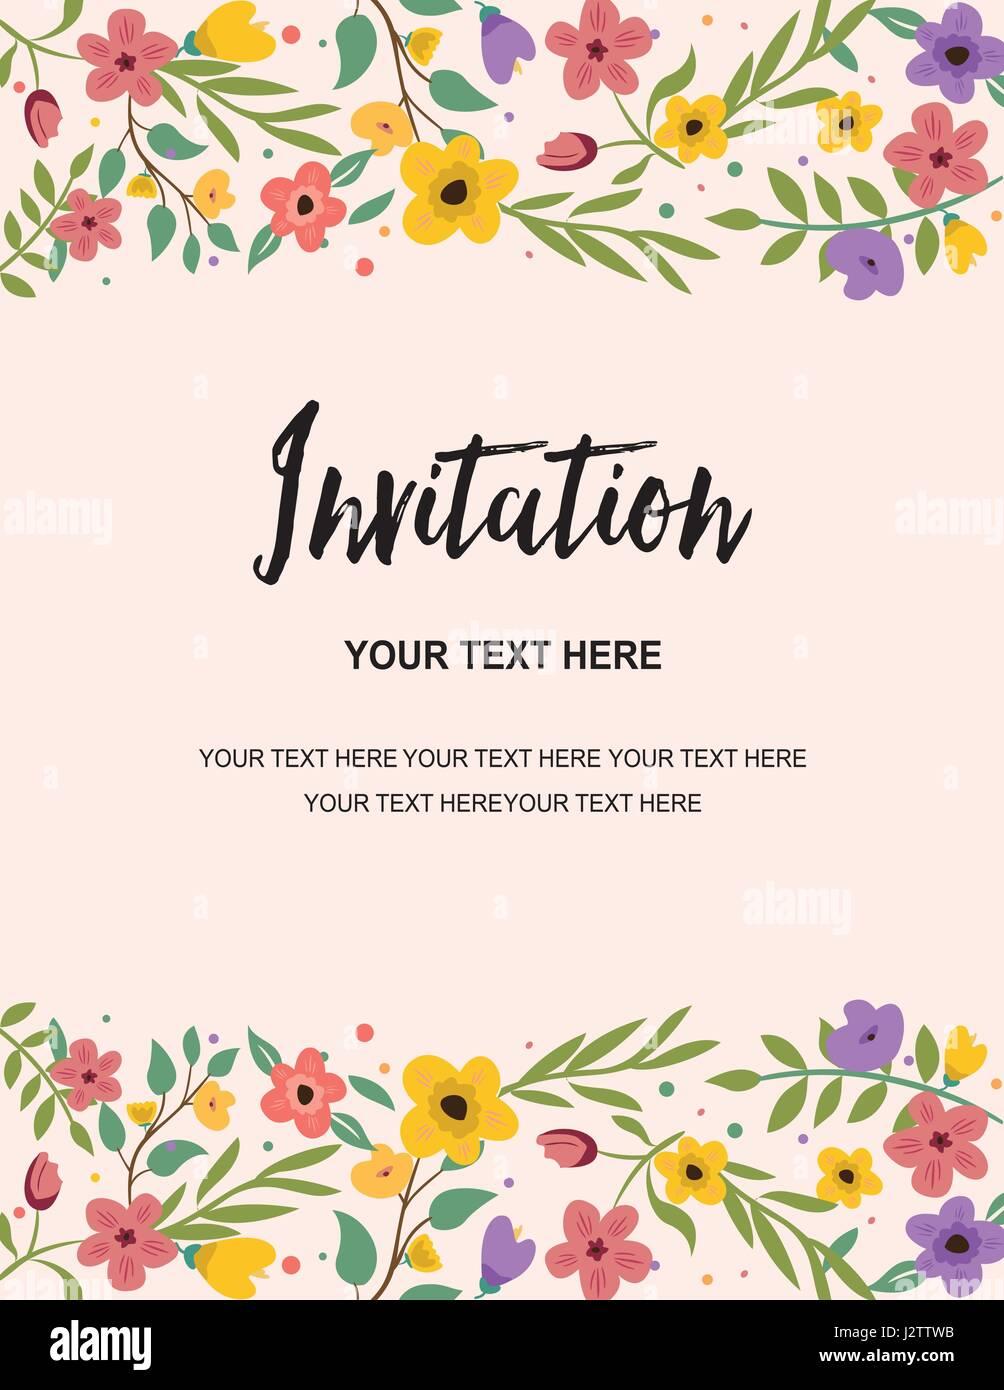 Wedding Party And Anniversary Invitation Card Retro Template